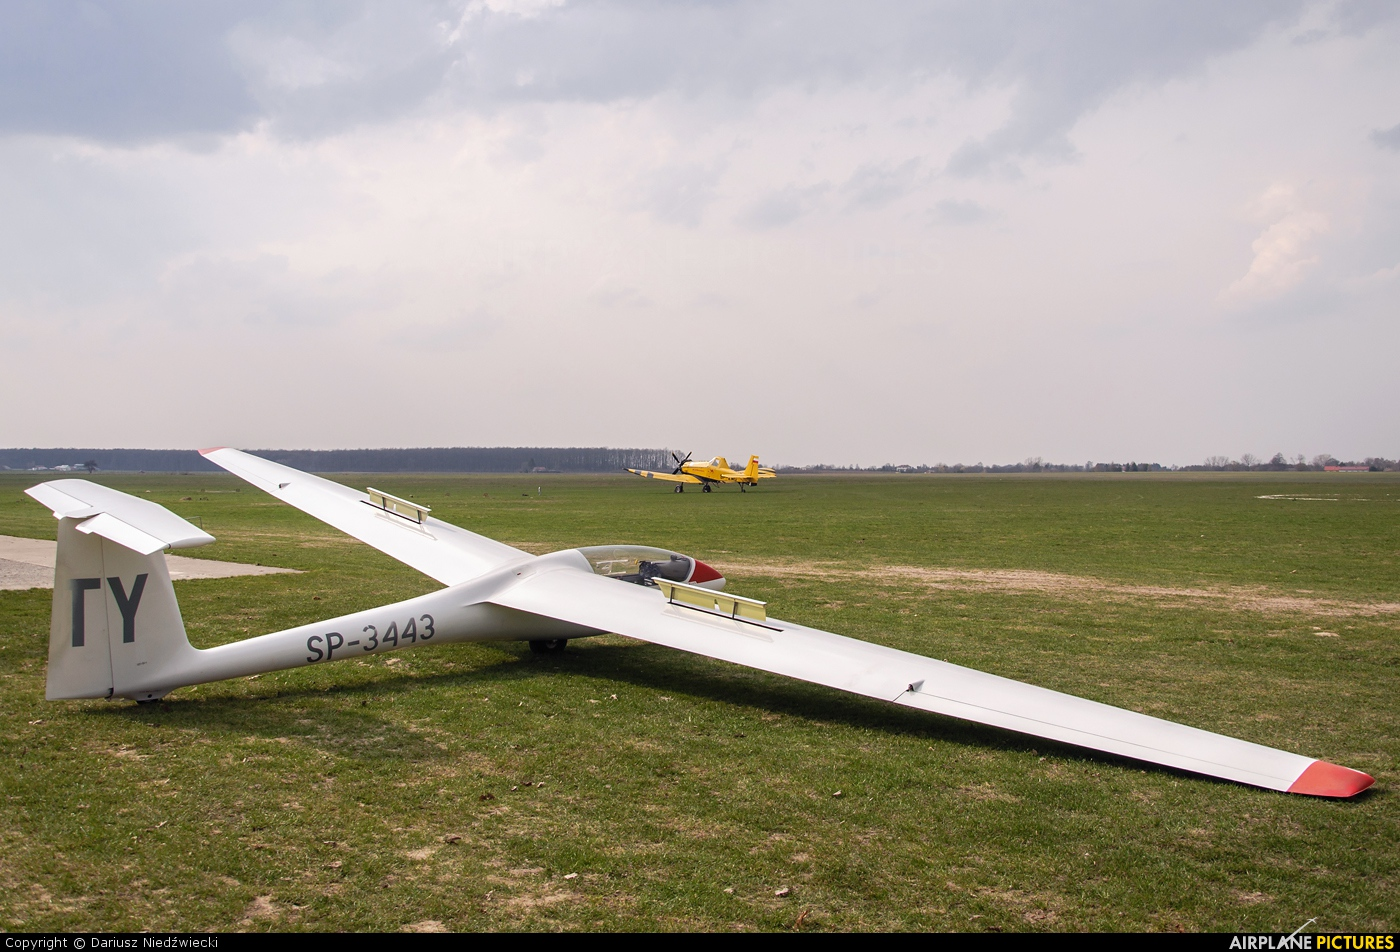 Aeroklub Lubelski SP-3443 aircraft at Lublin Radawiec